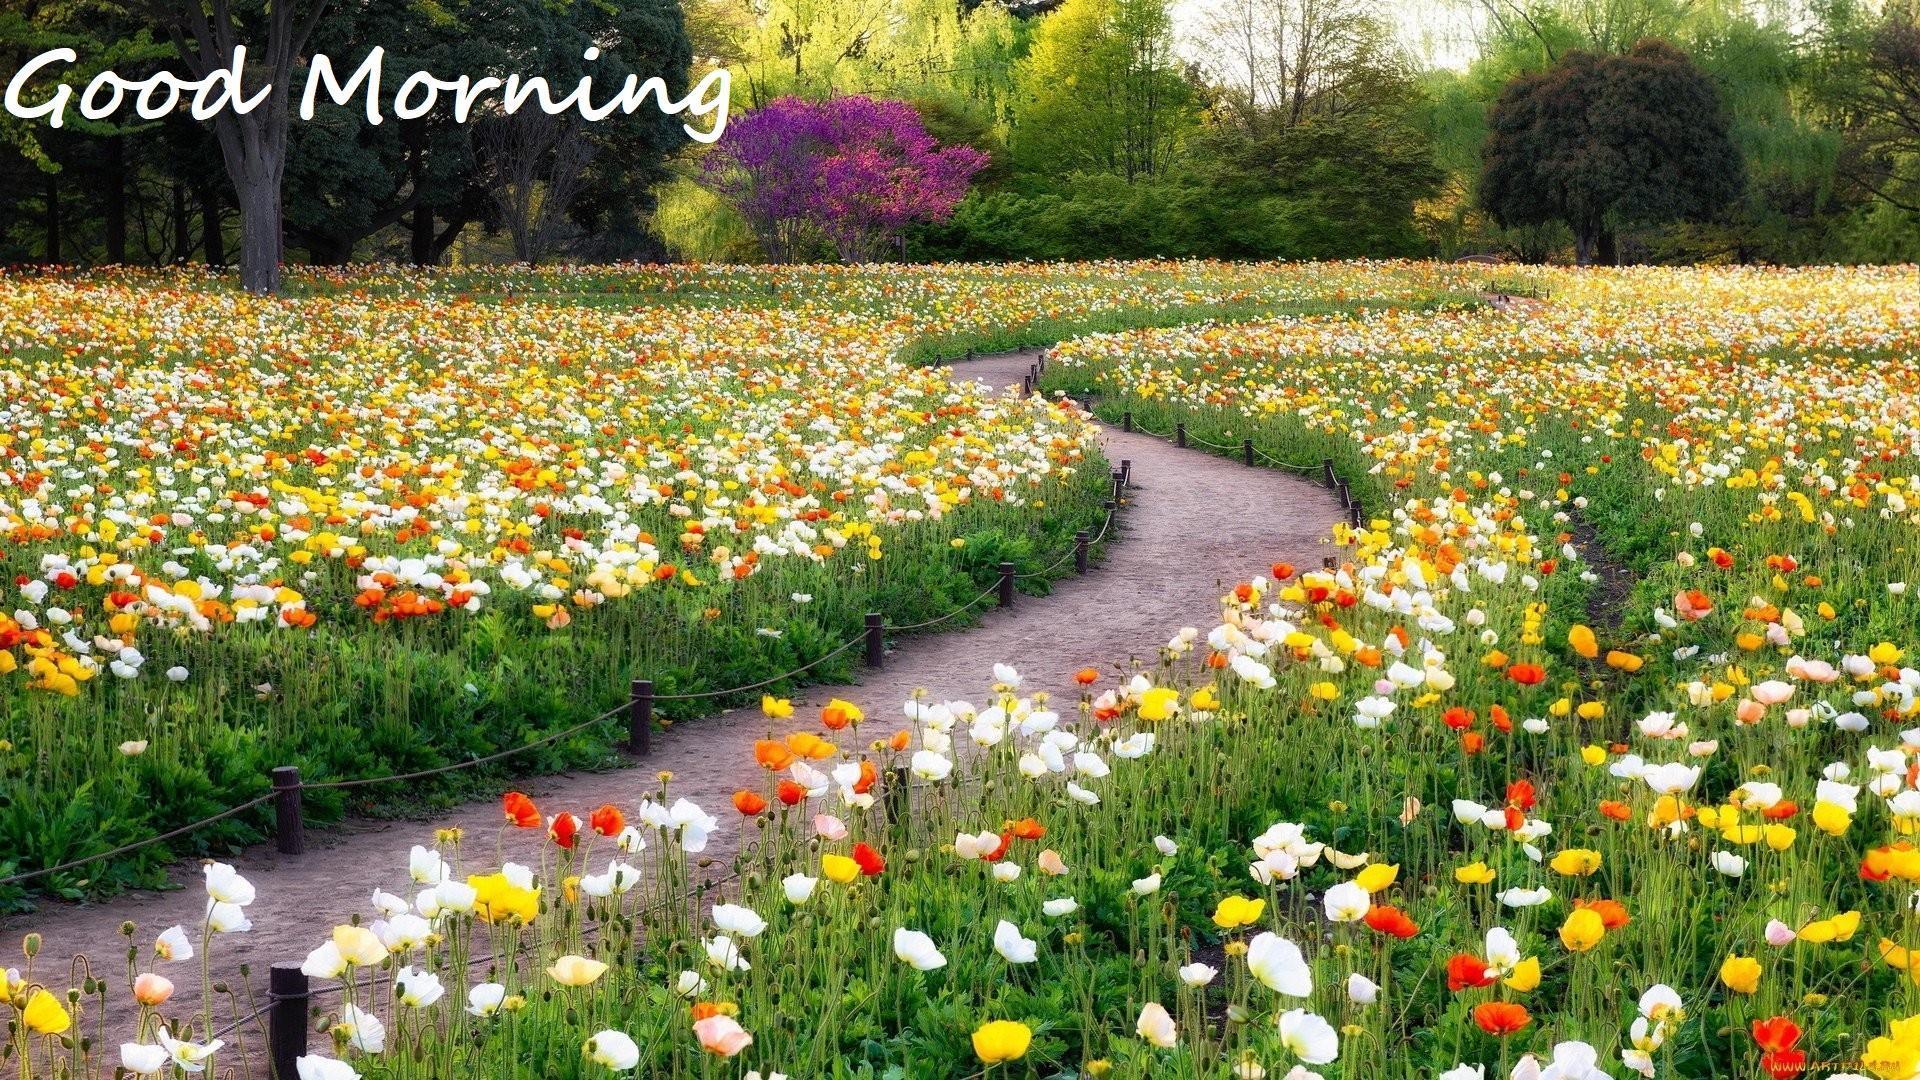 Flowers Gardens Wallpapers For Desktop Full Size - Wallpaper , HD Wallpaper & Backgrounds